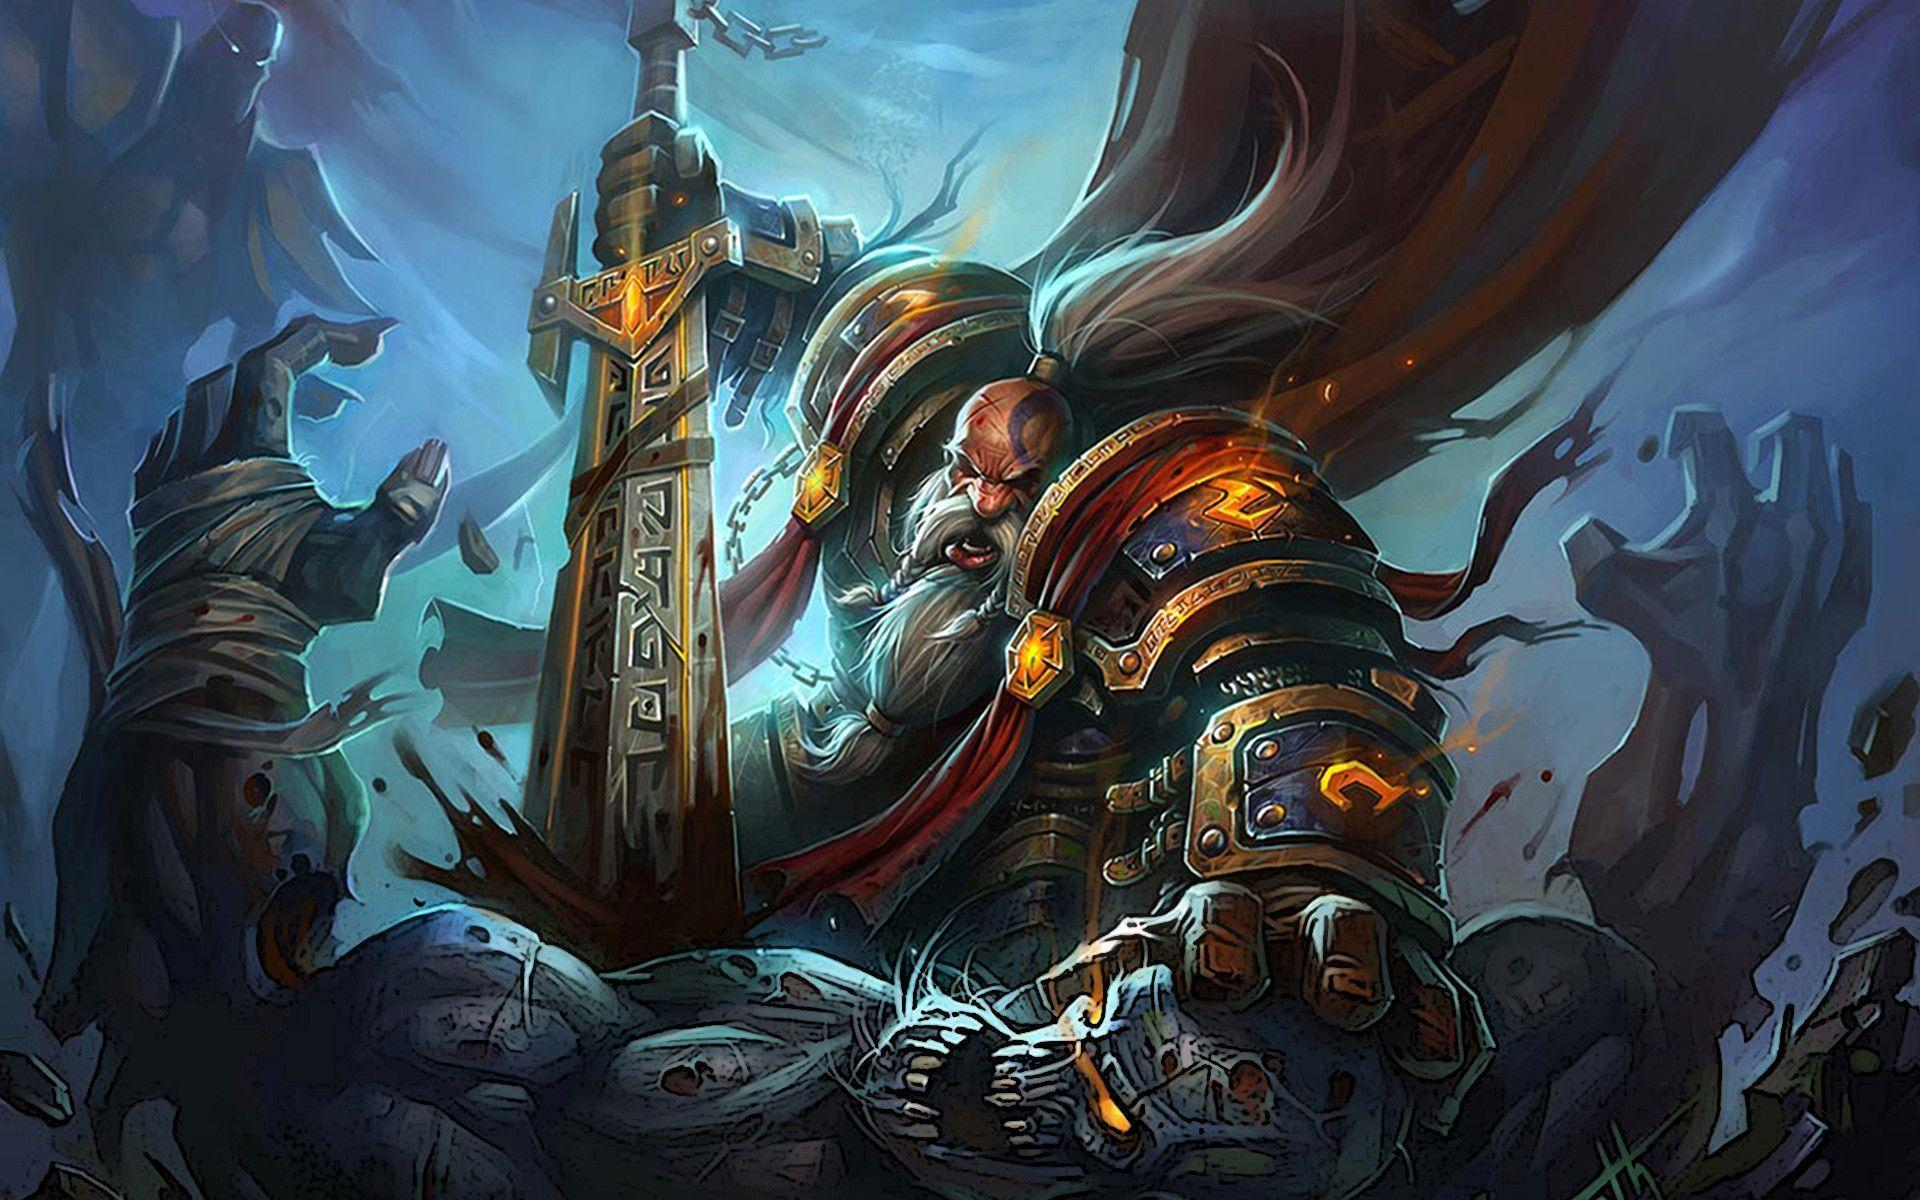 Cool World of Warcraft Wallpaper 09 | hdwallpapers-